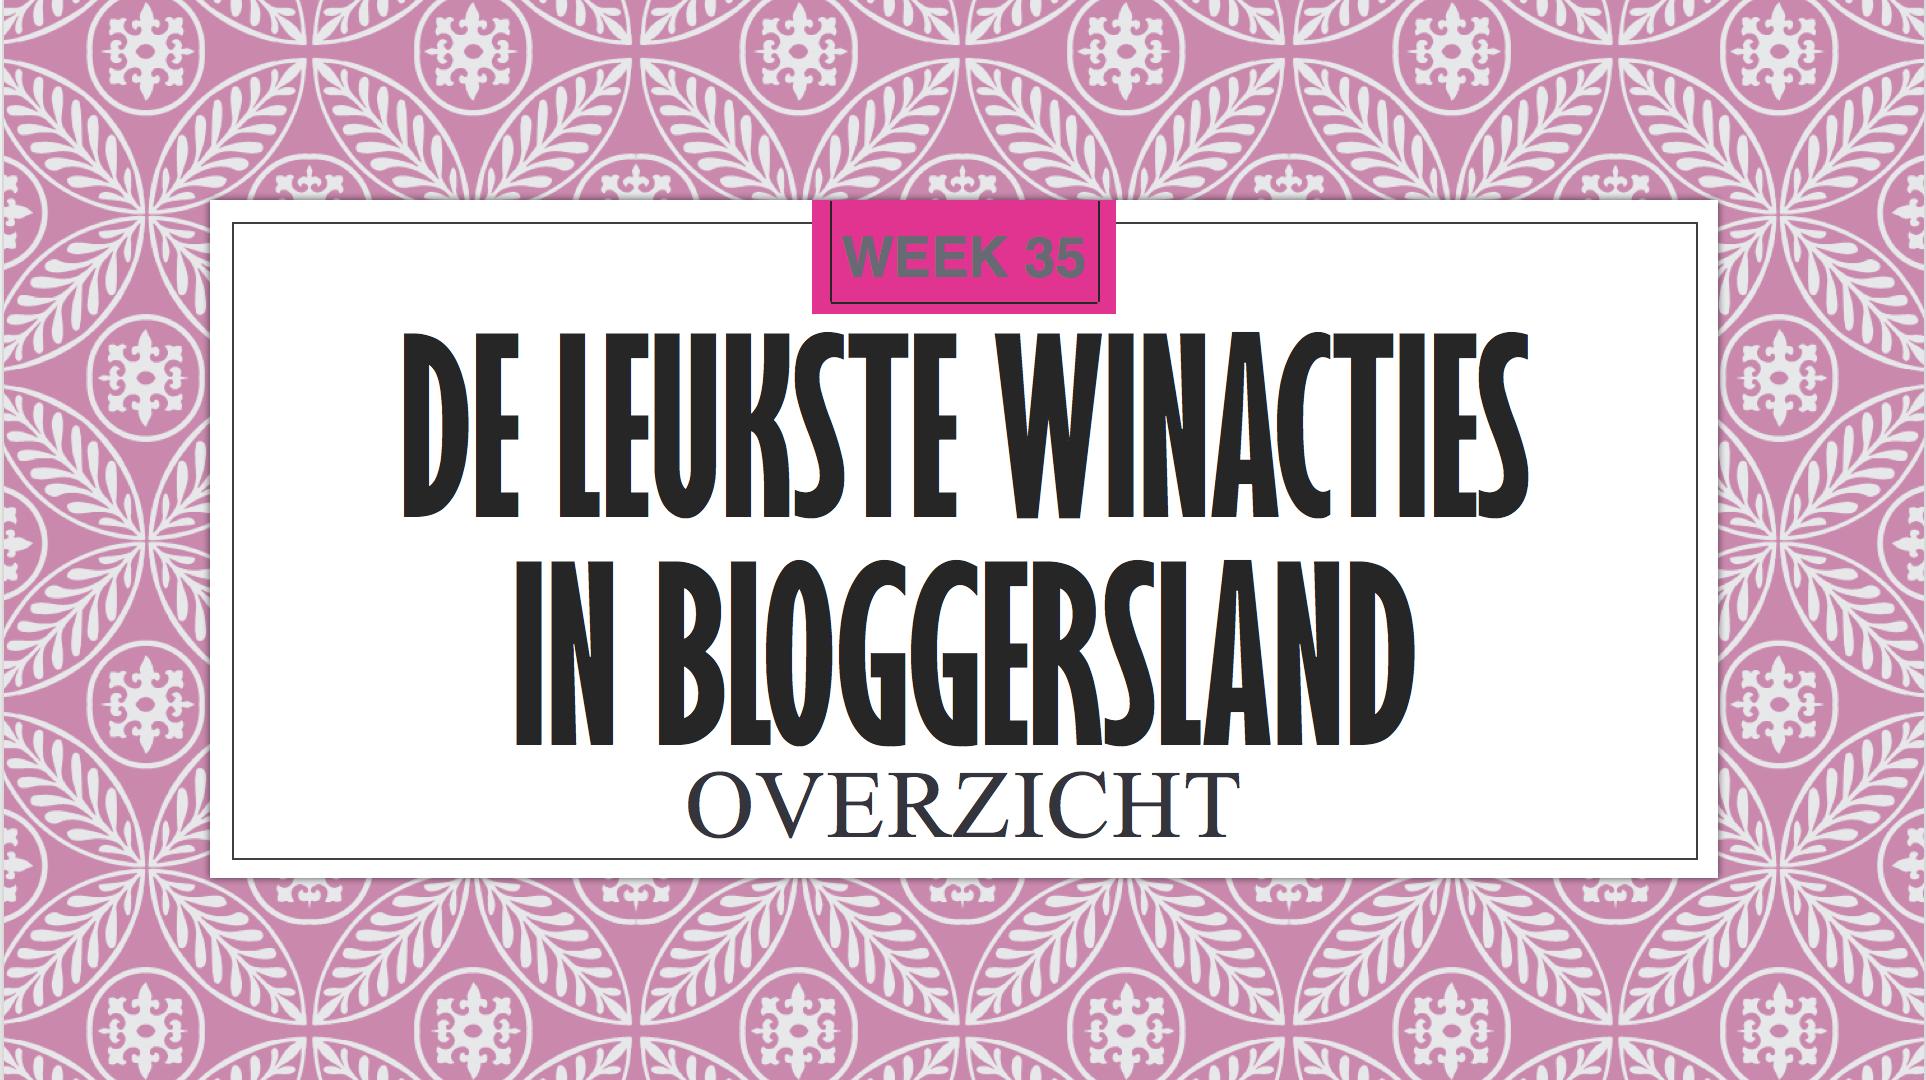 Leukste winacties in Bloggersland